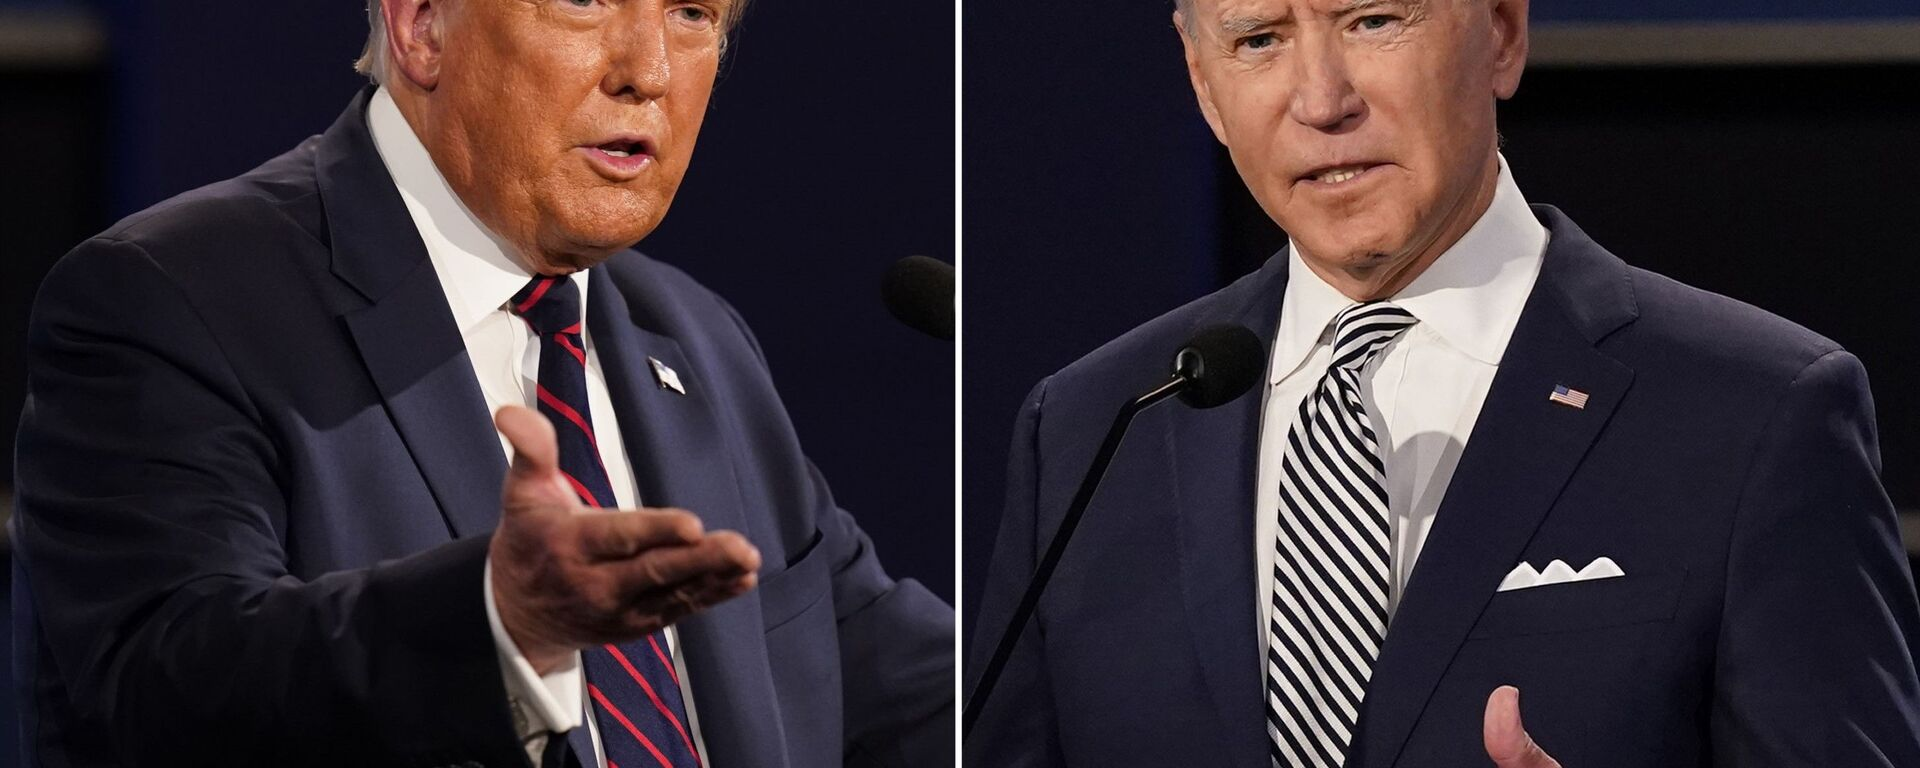 Scontro tra Joe Biden e Donald Trump - Sputnik Italia, 1920, 23.08.2021